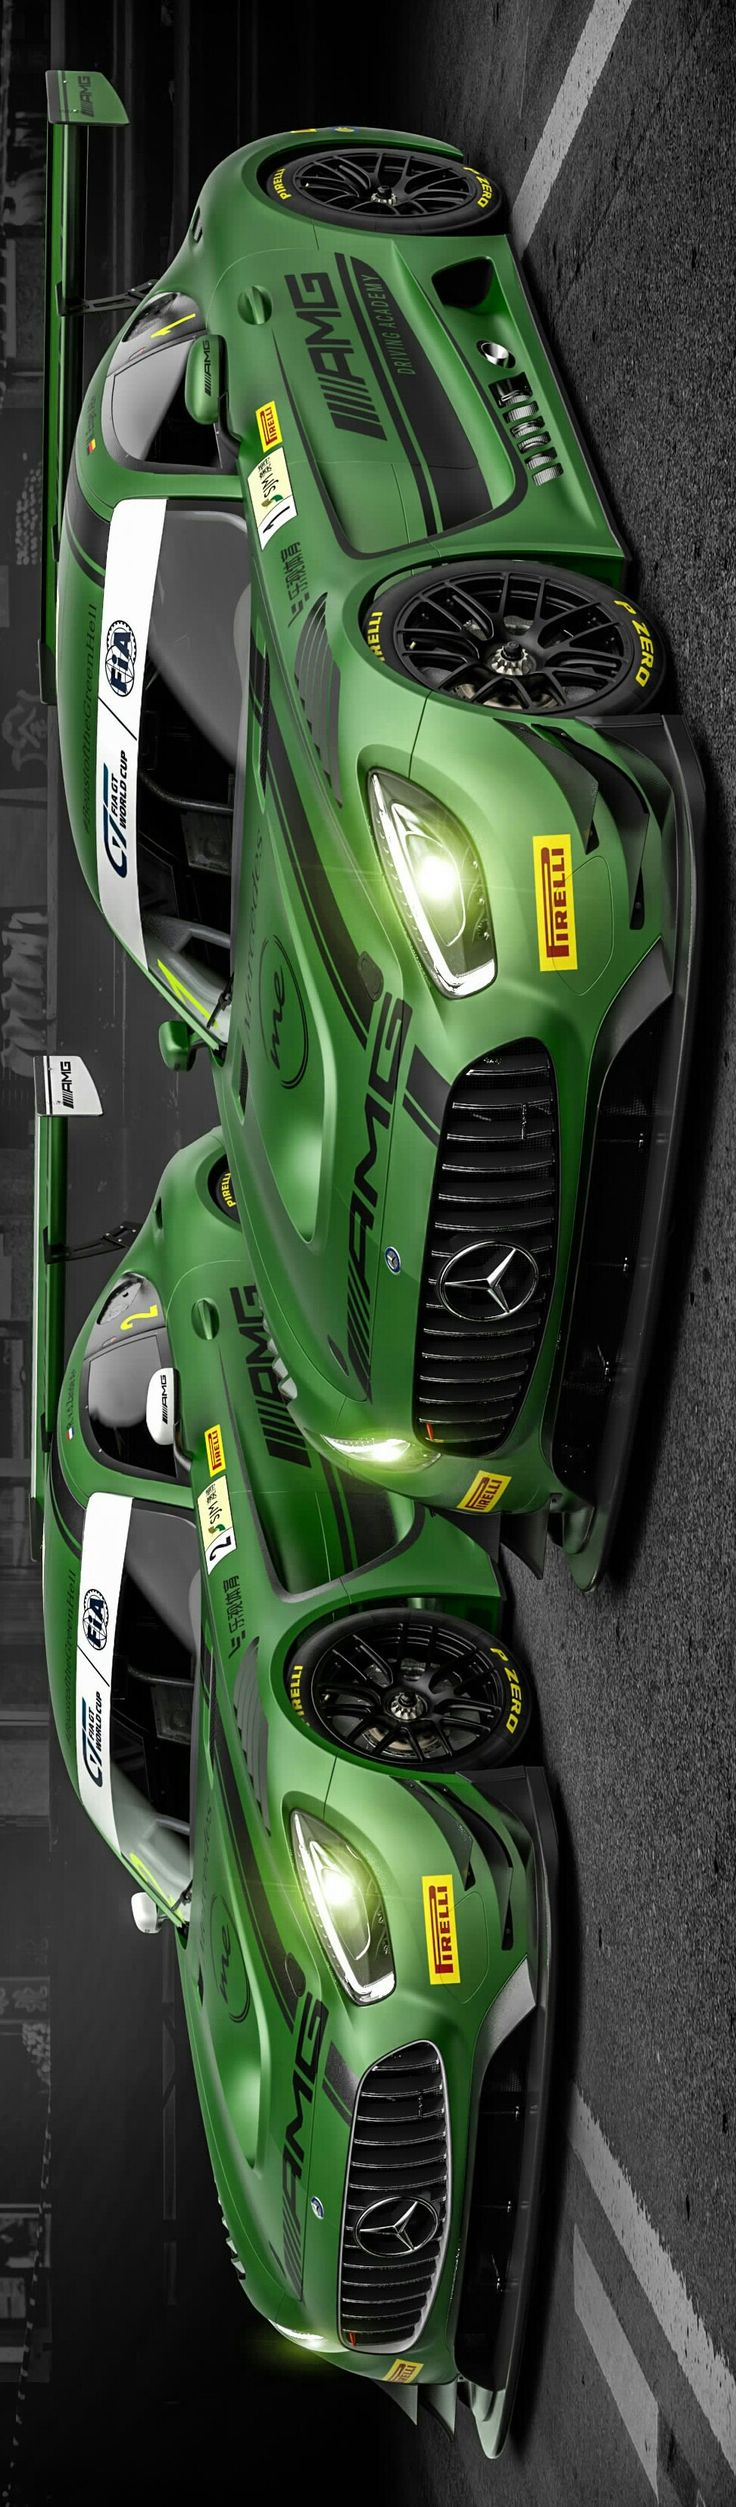 2017 Mercedes-AMG GT3 by Levon